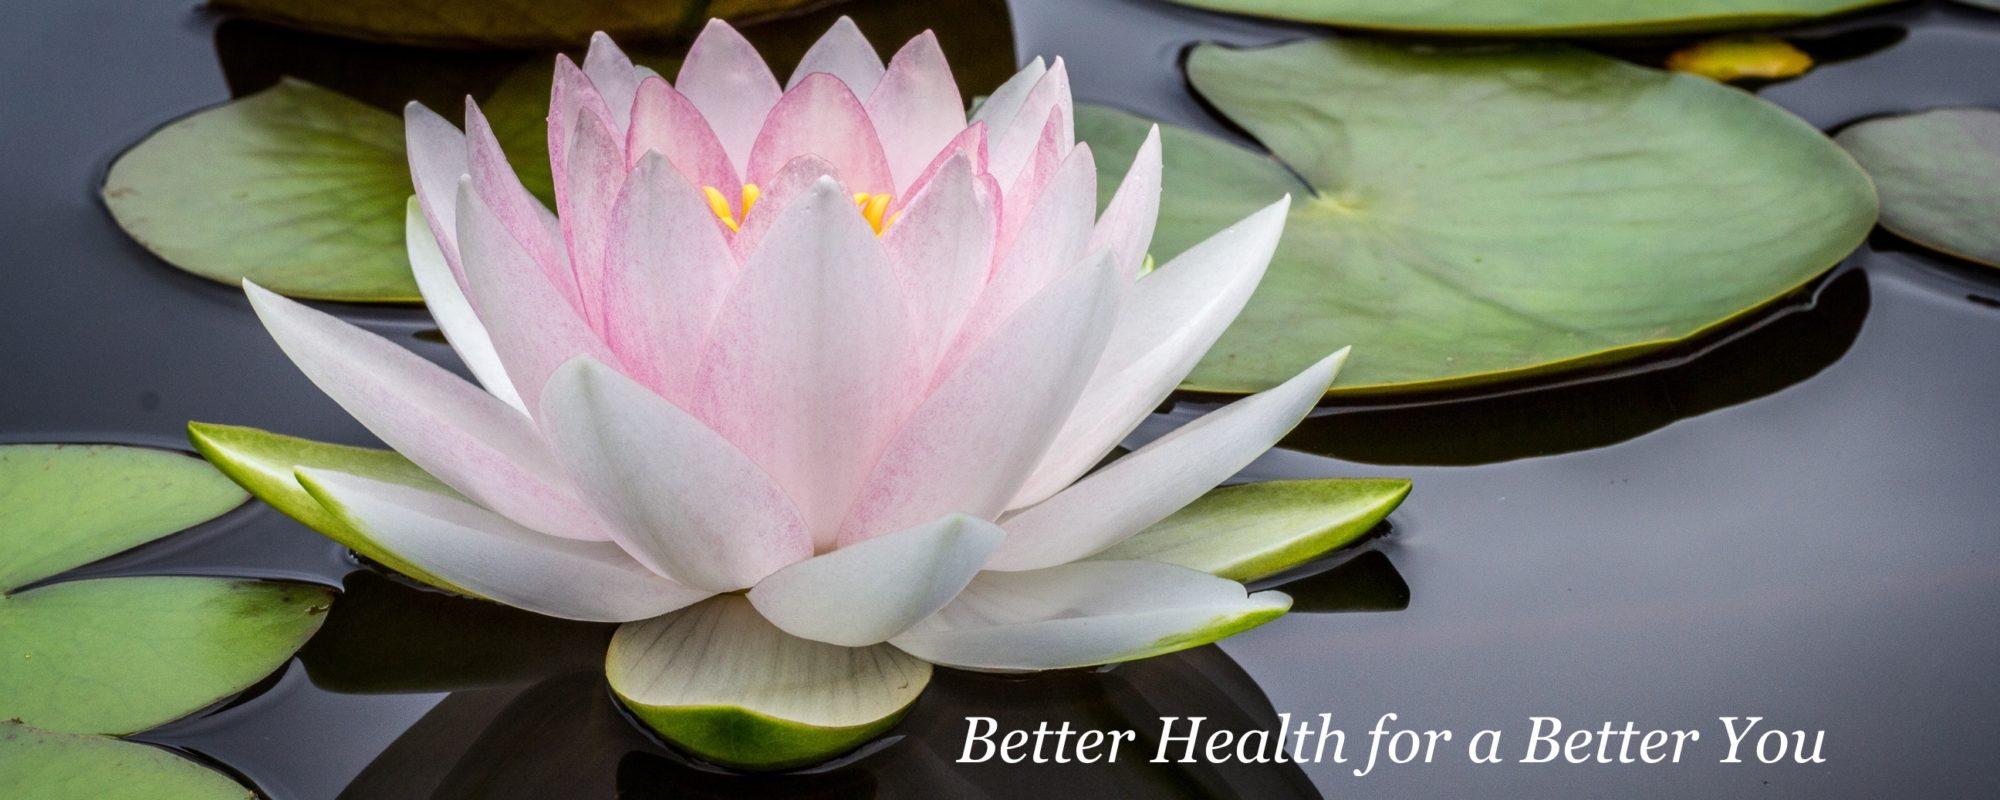 Allergy elimination allen acupuncture and wellness izmirmasajfo